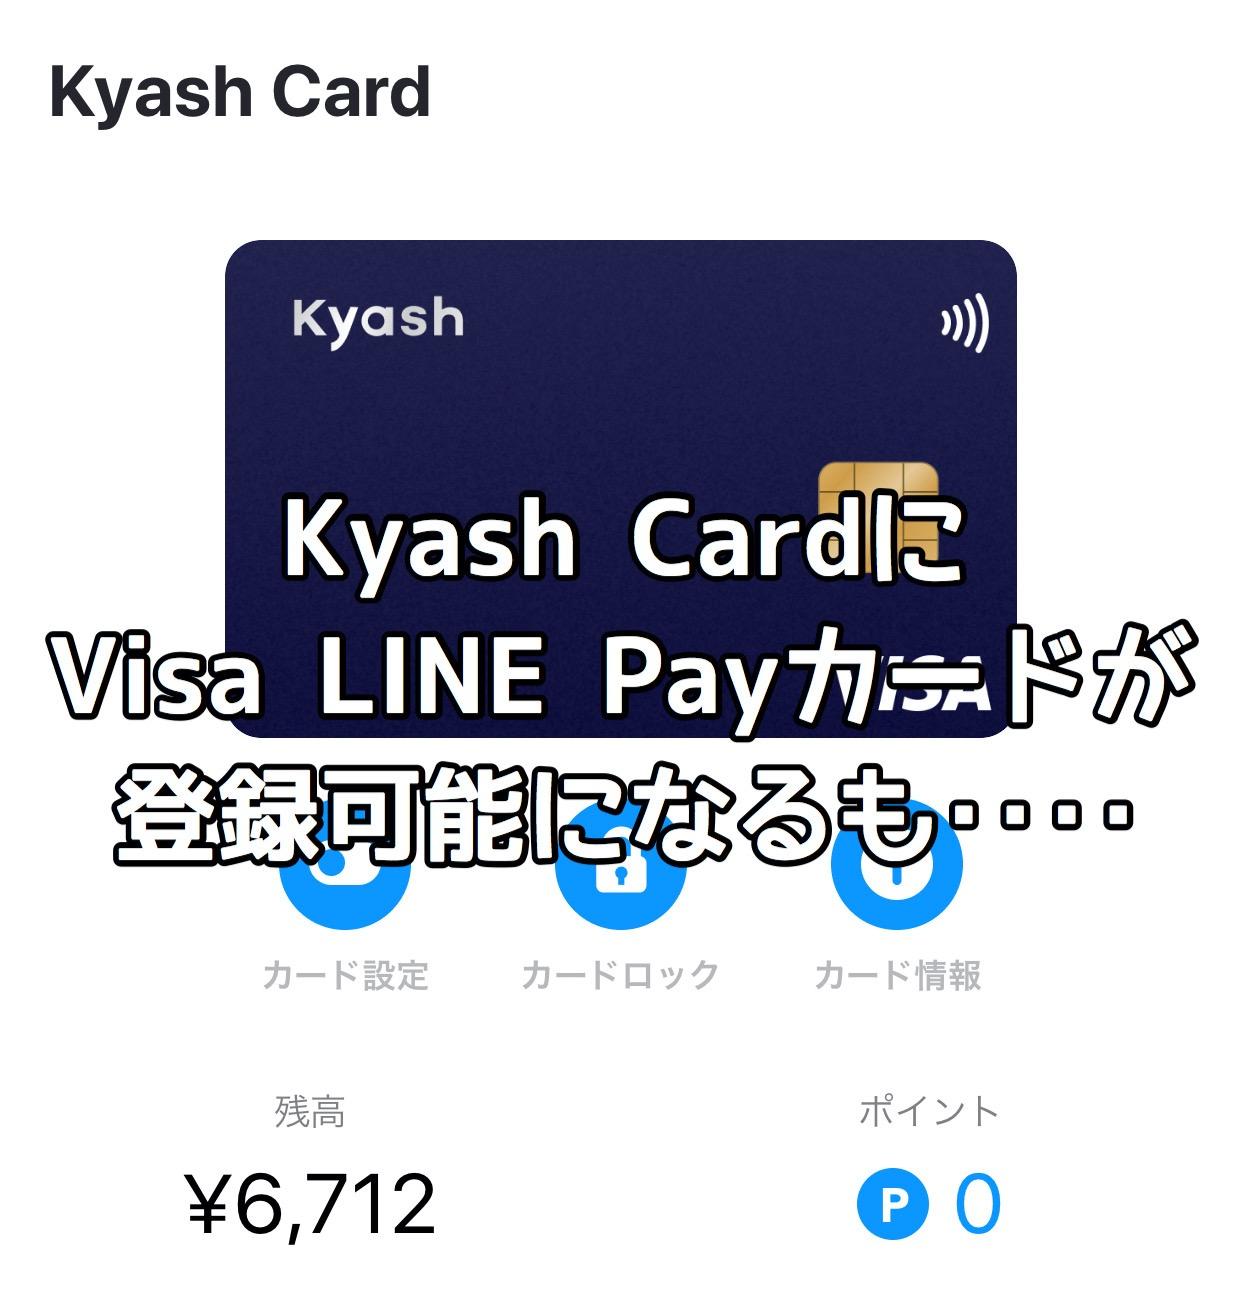 【Kyash Card】チャージ用に「Visa LINE Payカード」が登録可能になるも‥‥